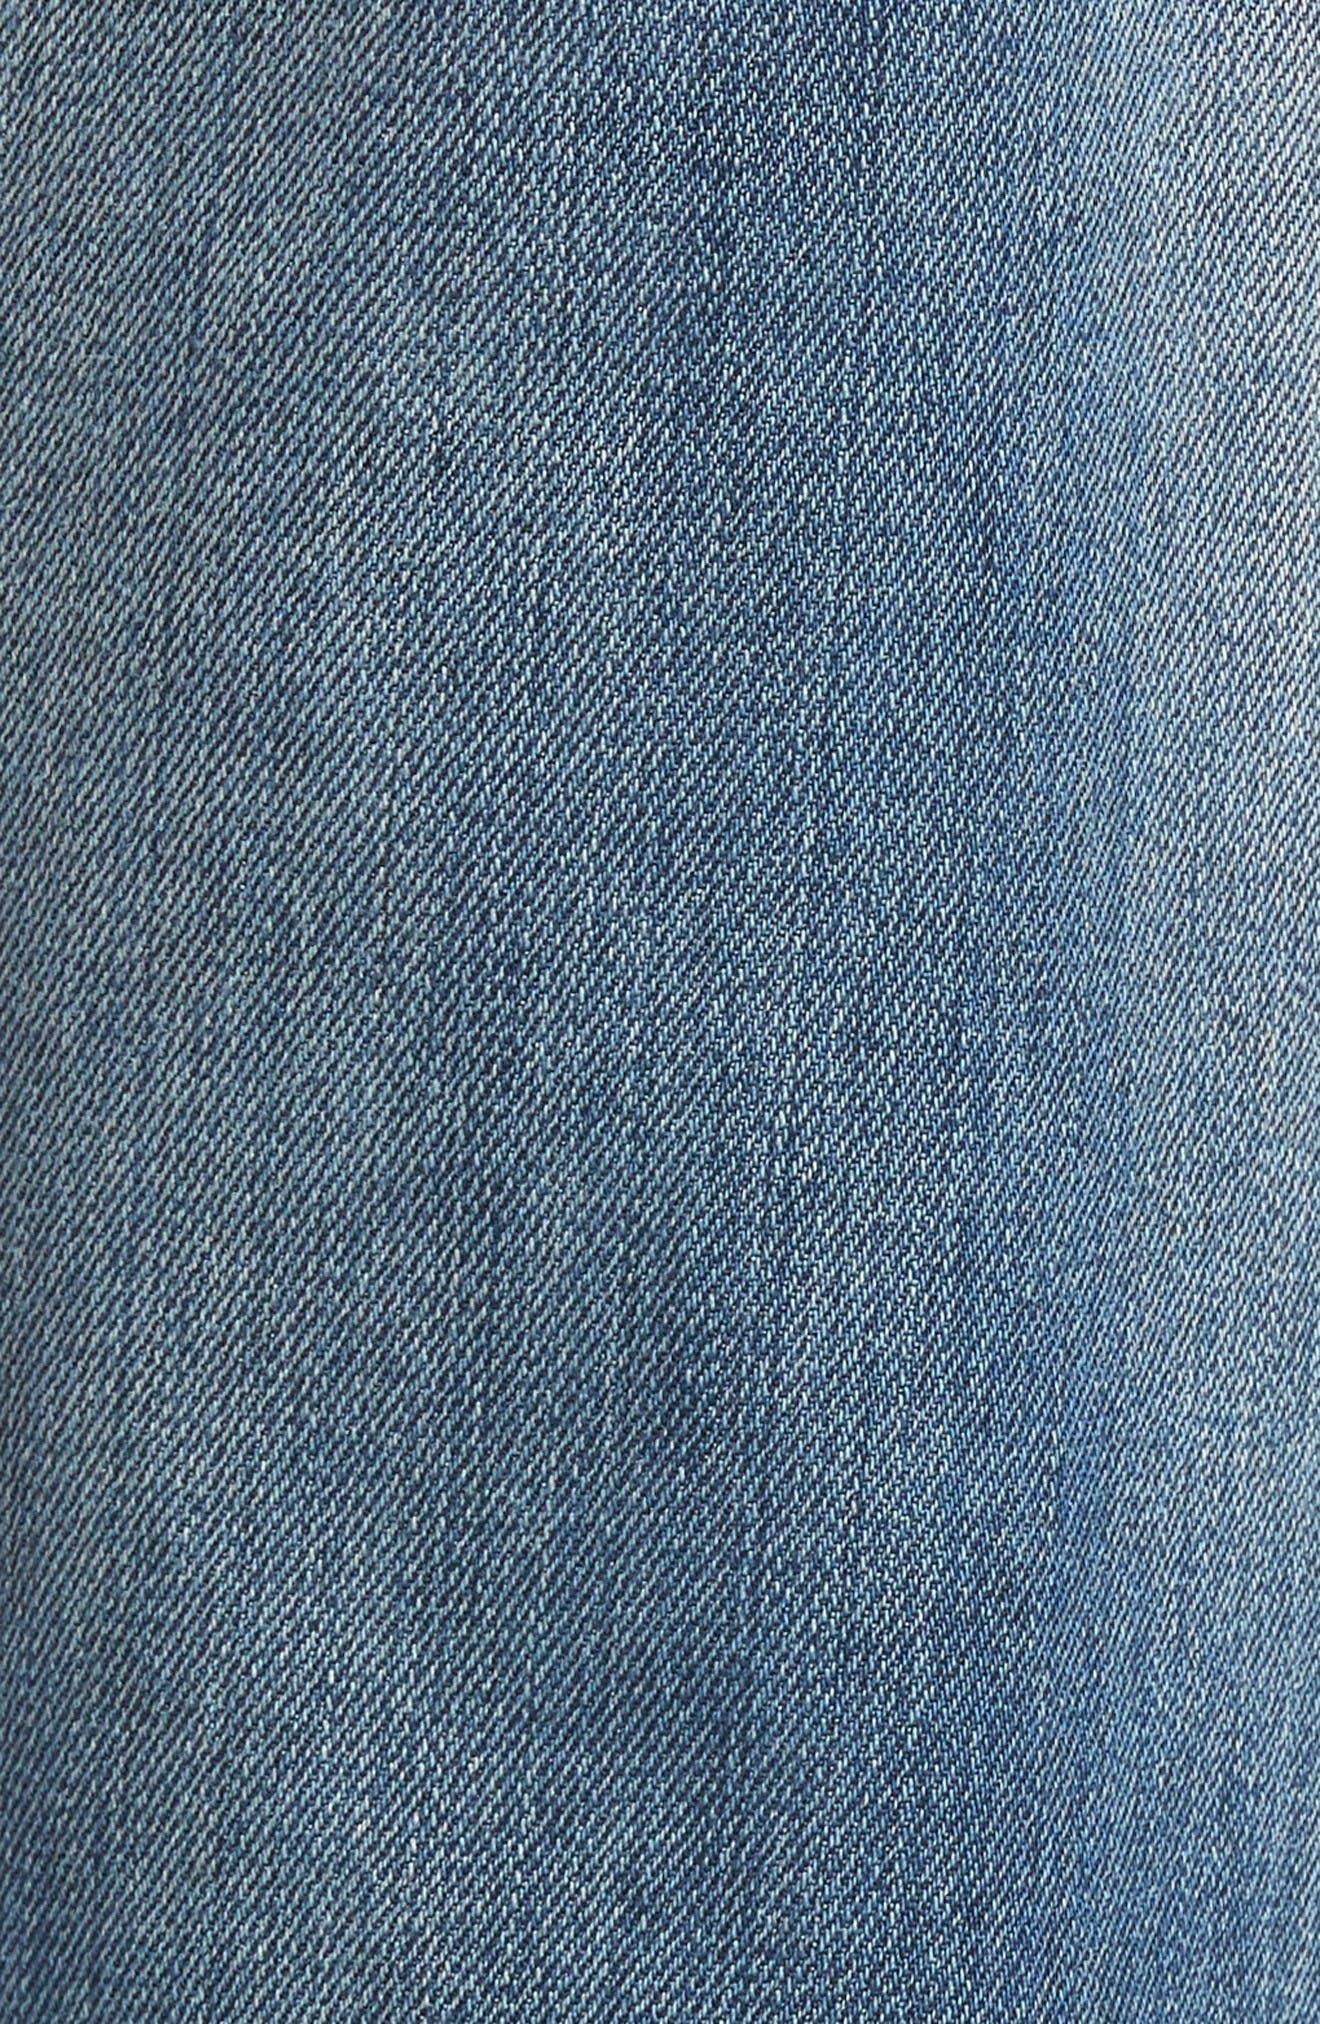 Alternate Image 5  - Levi's® 511™ Slim Fit Jeans (The Cavern)